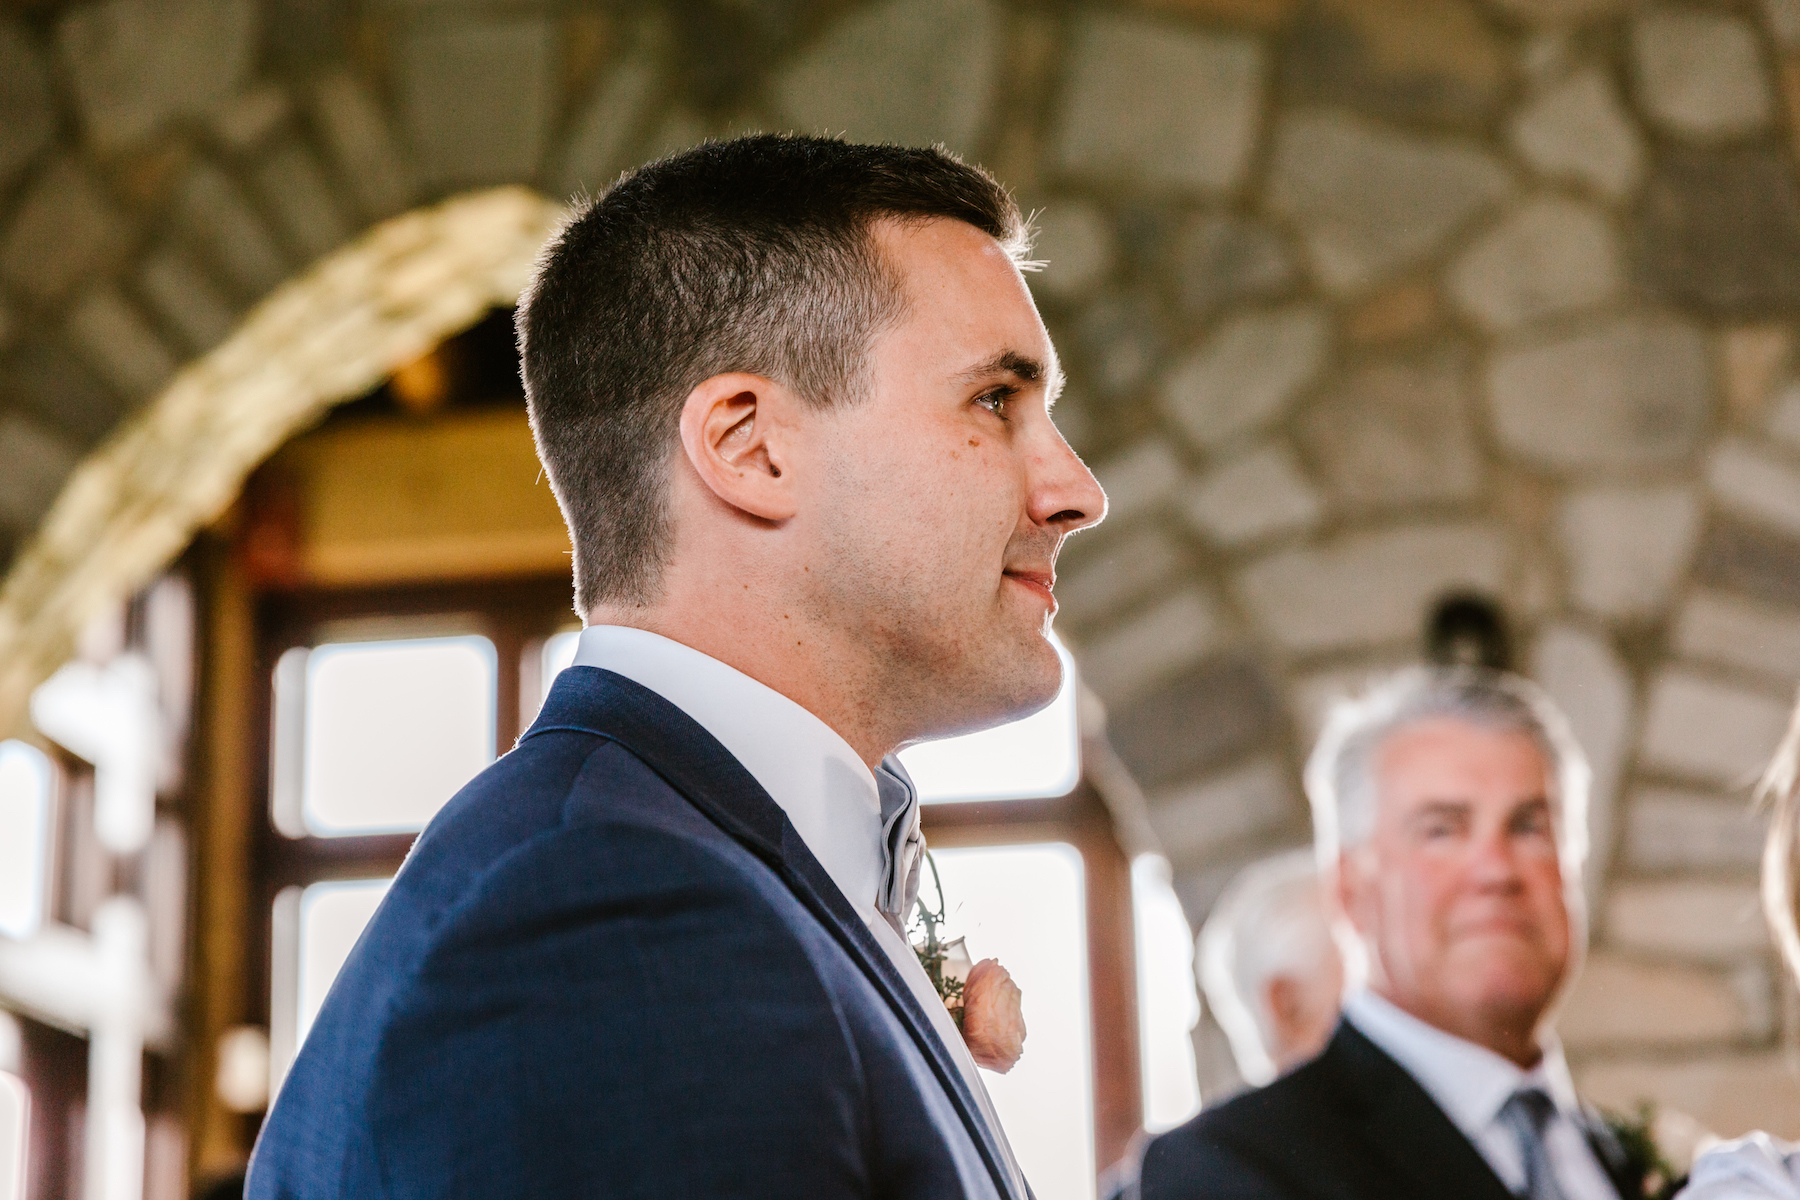 wedding-engagement-photographer-spartanburg-greenville-columbia-carolina-south-north-479.JPG